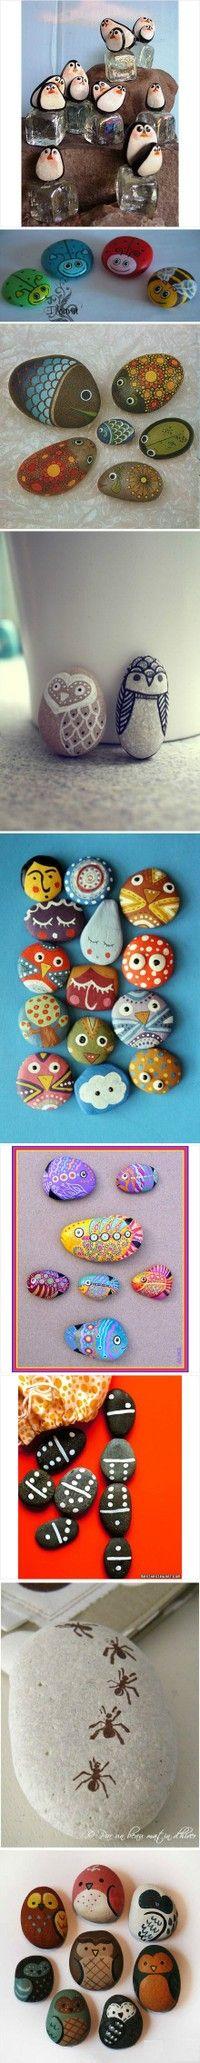 My kids love painting rocks